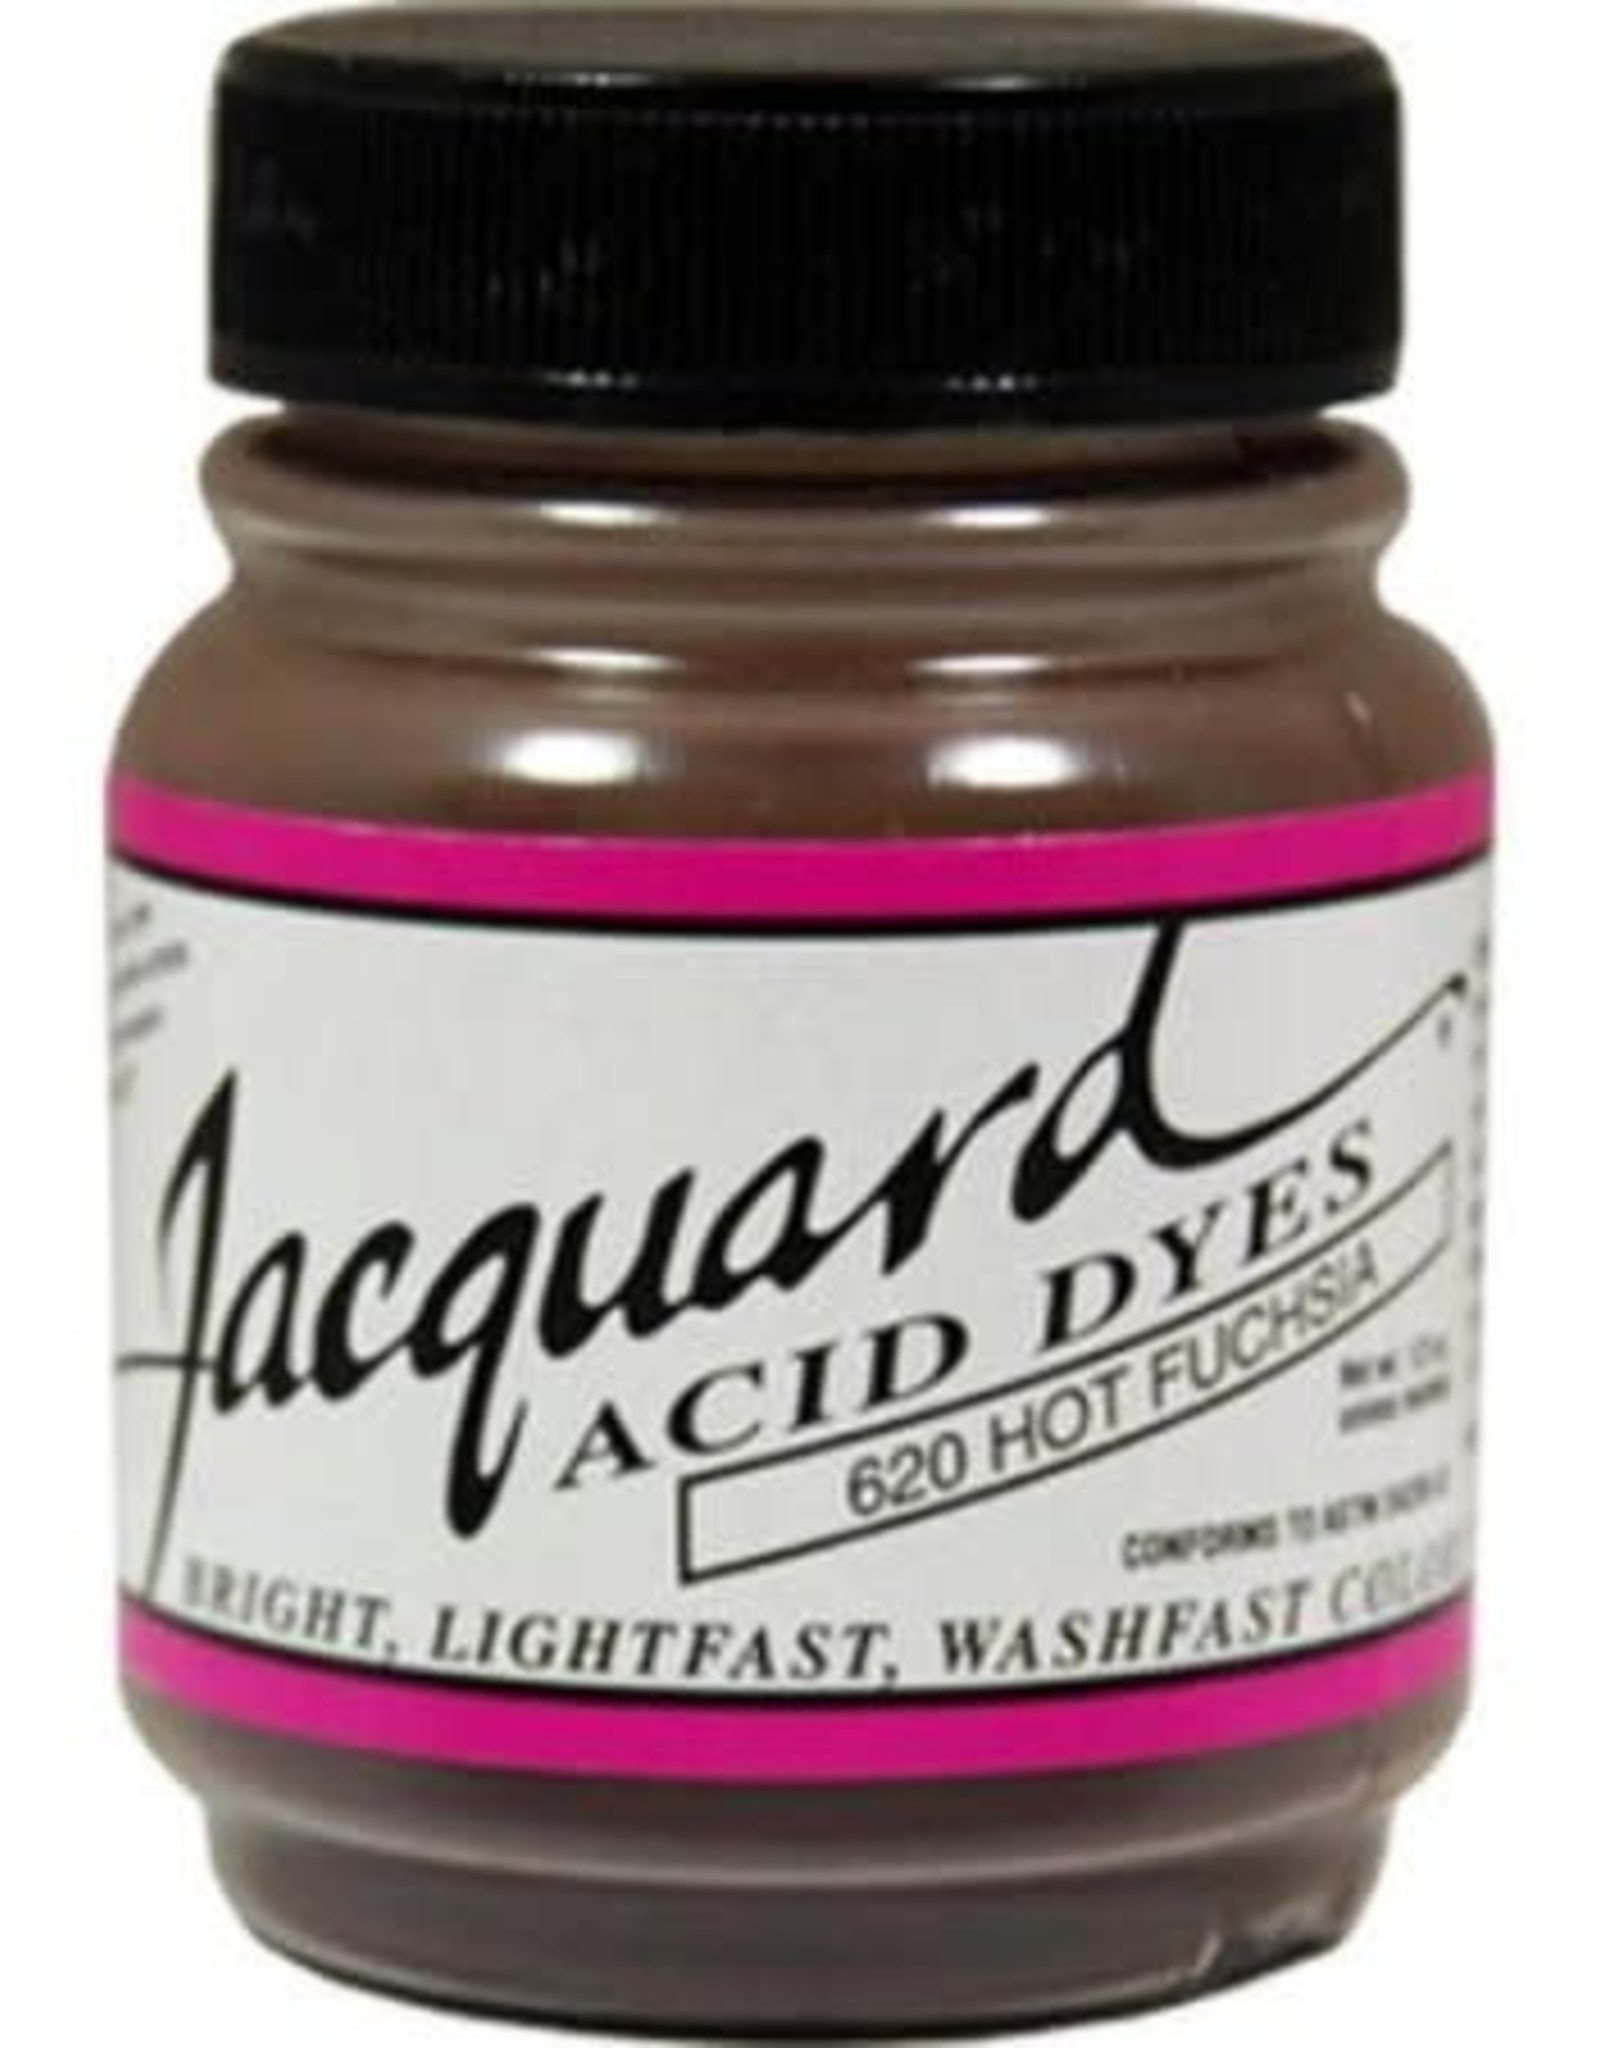 Jacquard Jacquard Acid Dye Hot Fuchsia